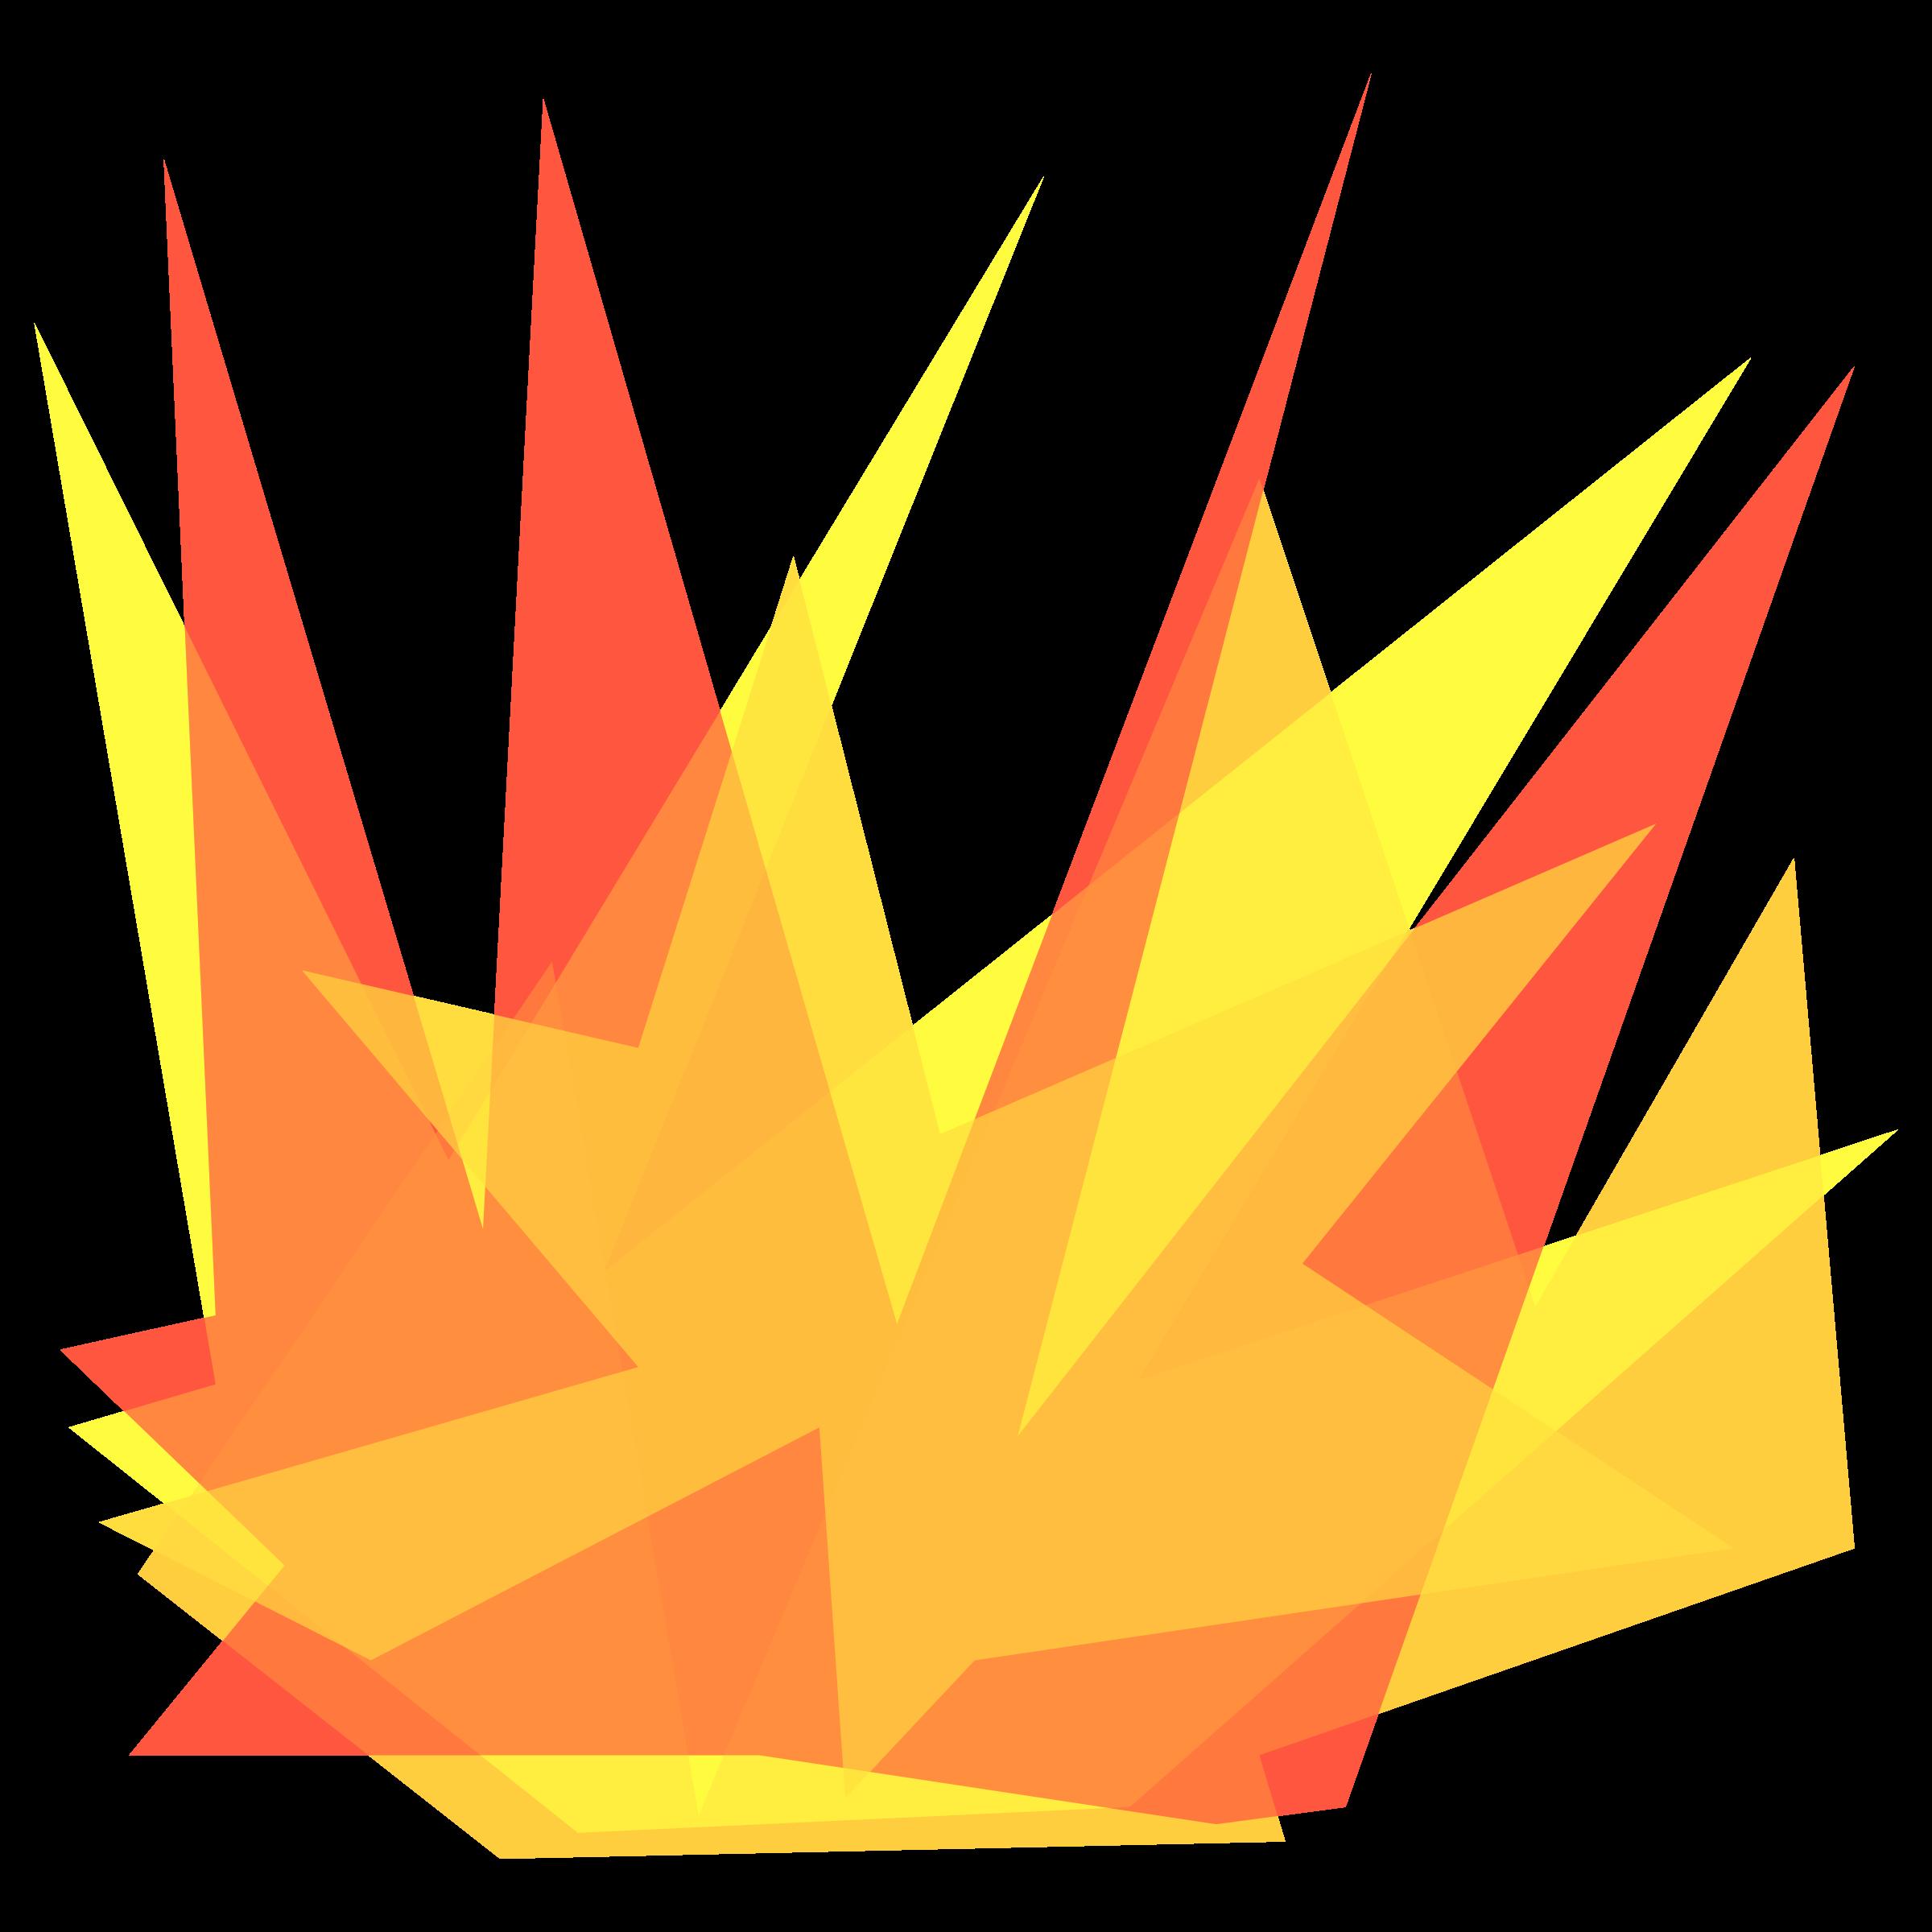 Simple cartoon big image. Explosion clipart boom